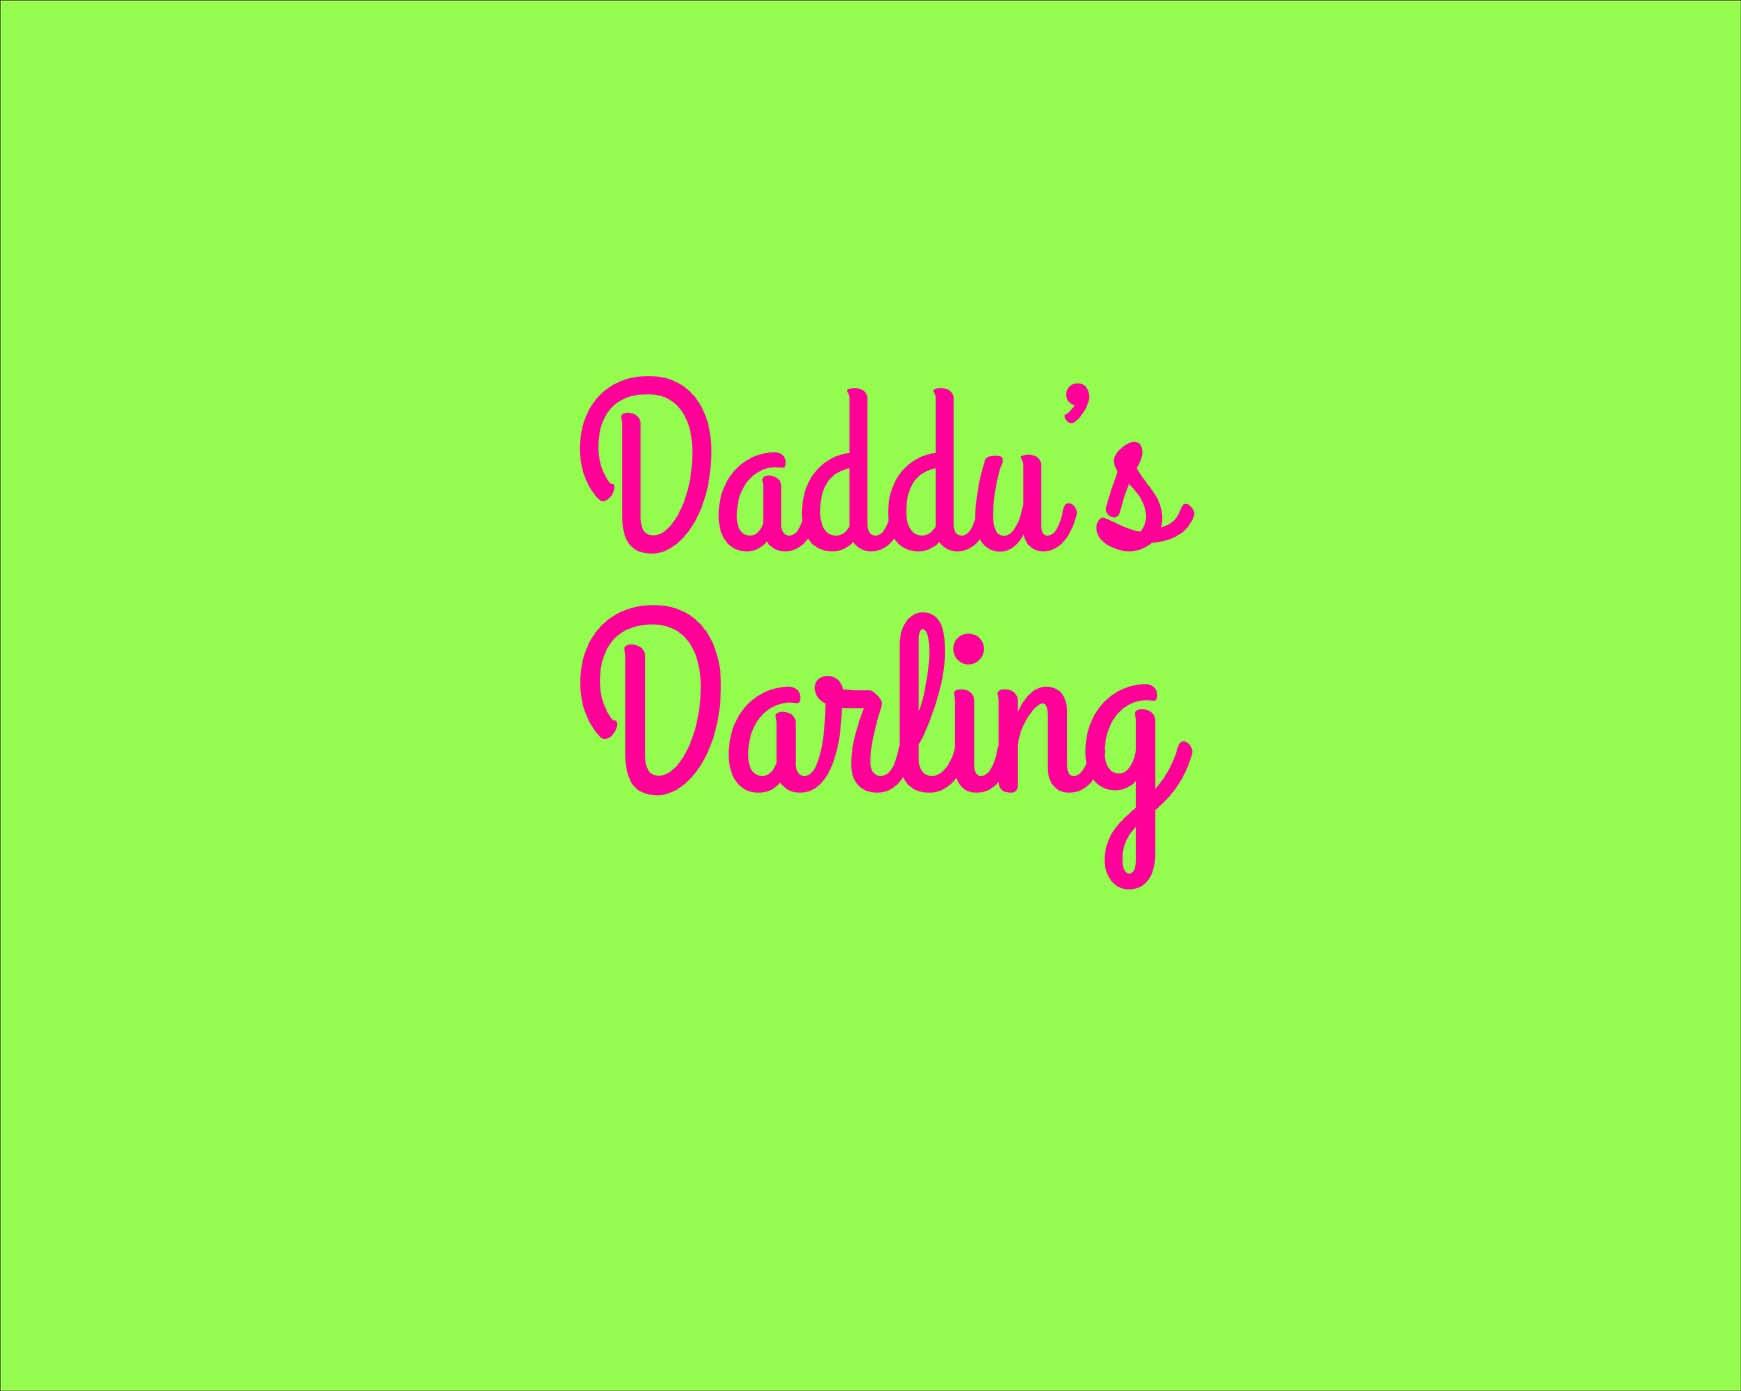 DADDU-S-DARLING